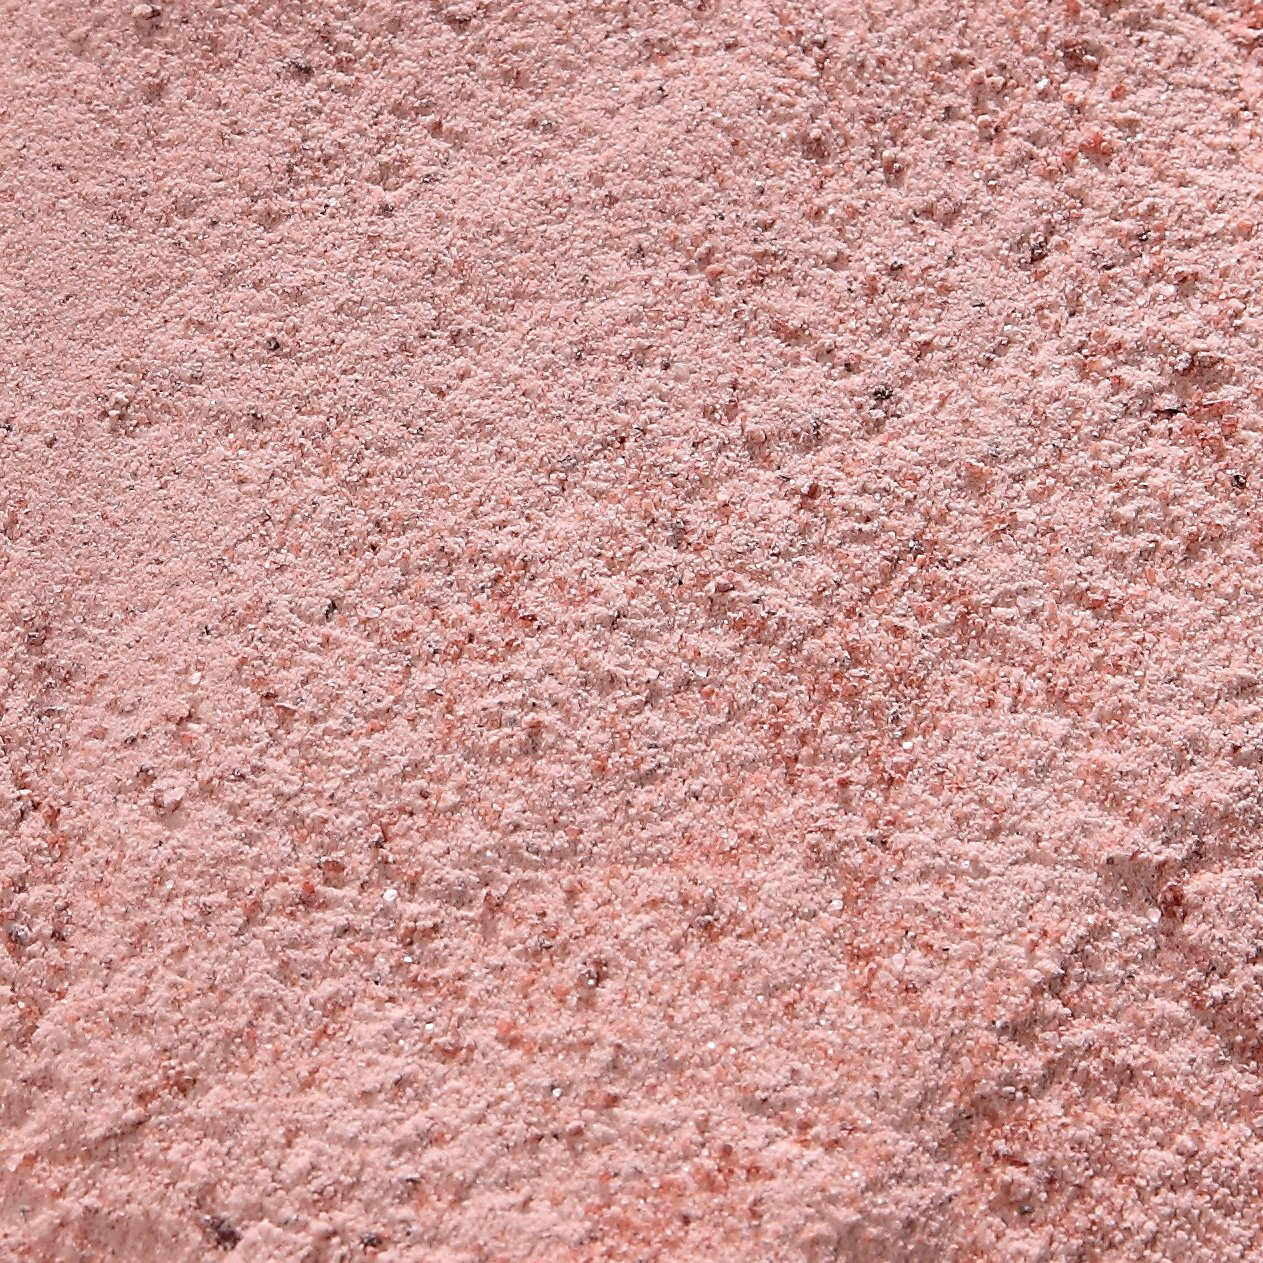 The Spice Lab (5 Lb) Kala Namak Himalayan Black Crystal Indian Salt - Mineral Enriched Kosher Gluten-Free All Natural Salt - Fine Ground - 5 Pounds by The Spice Lab